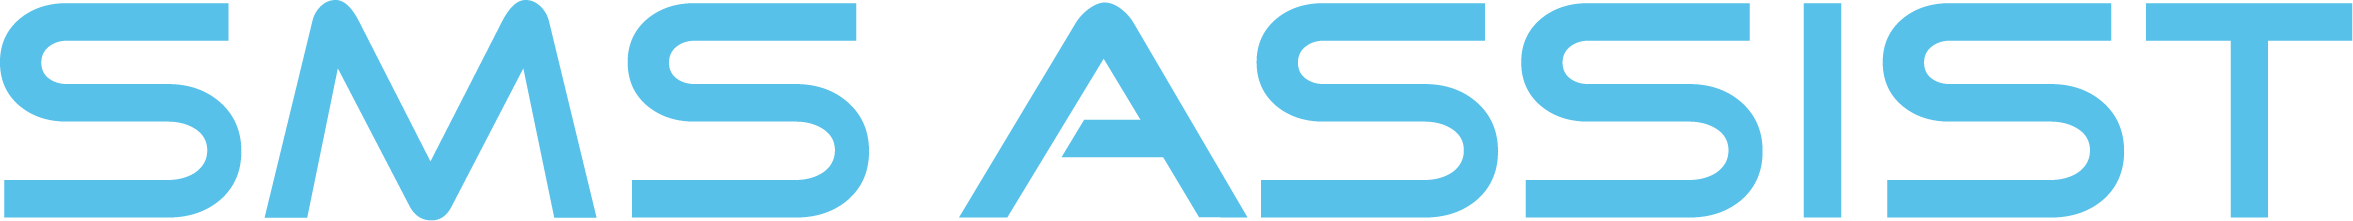 SMS Assist-logo